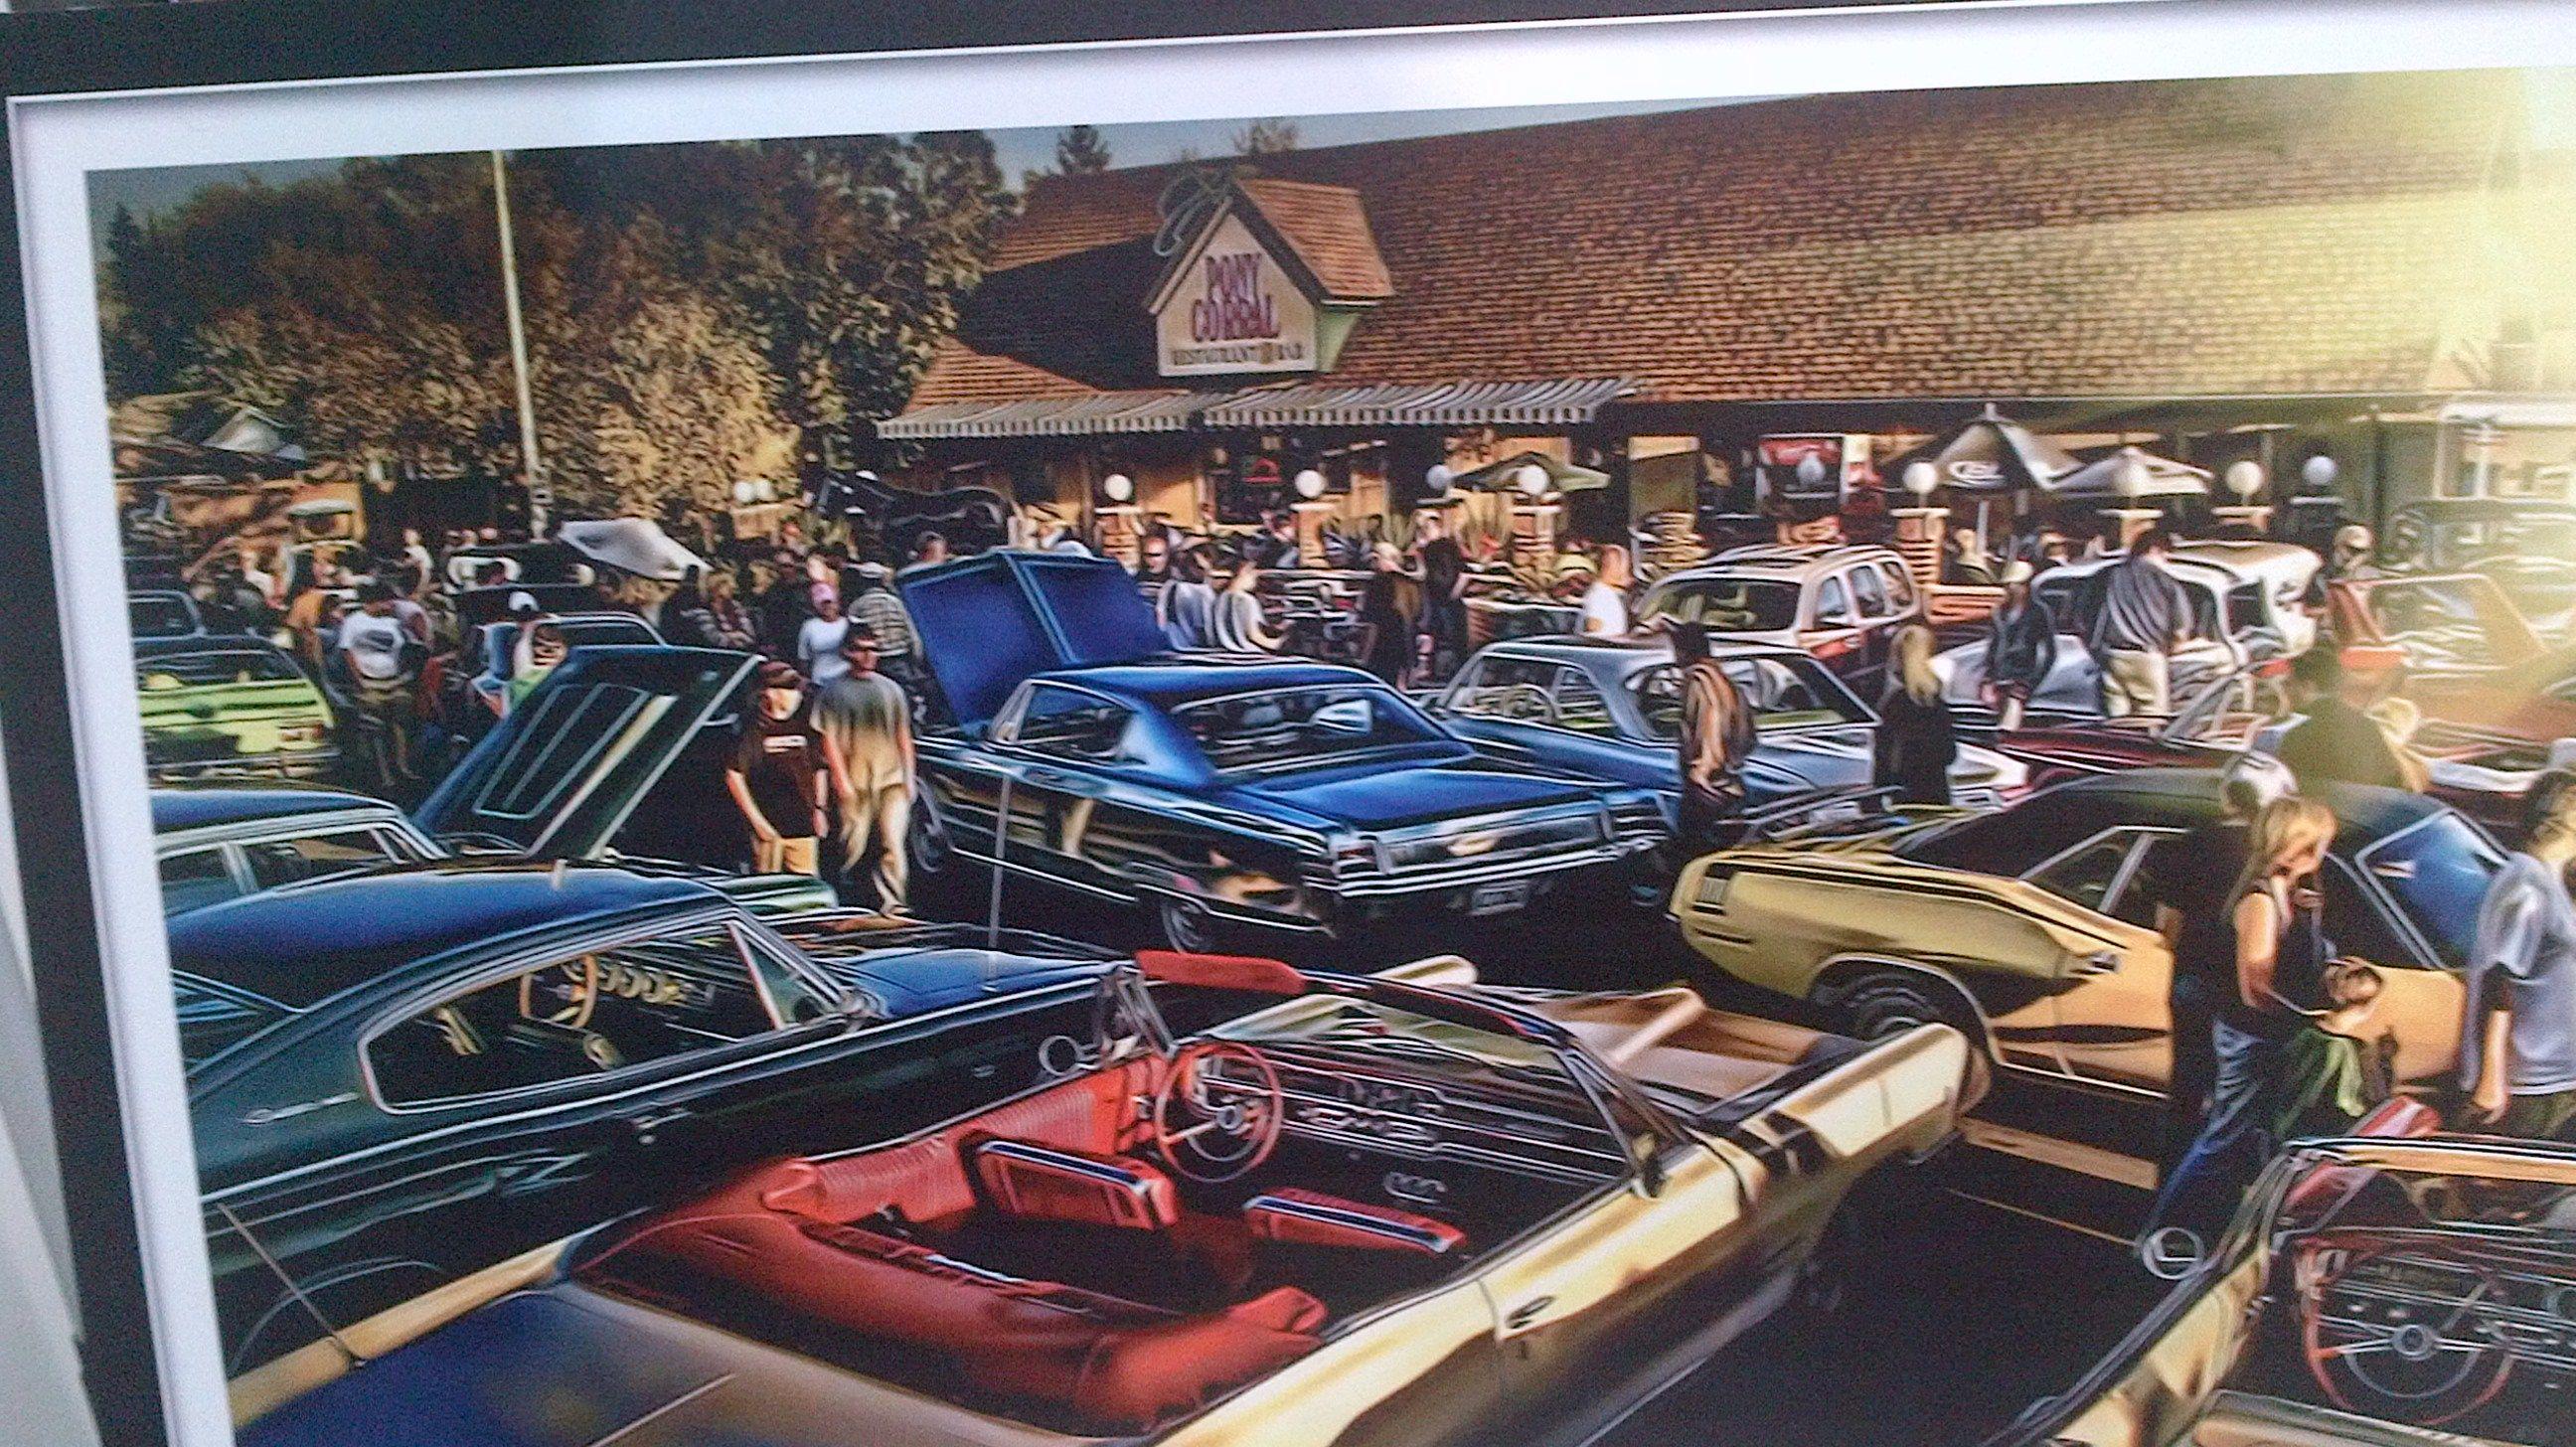 Pony Corral Auto Show Paining Winnipeg Manitoba Canada Vintage